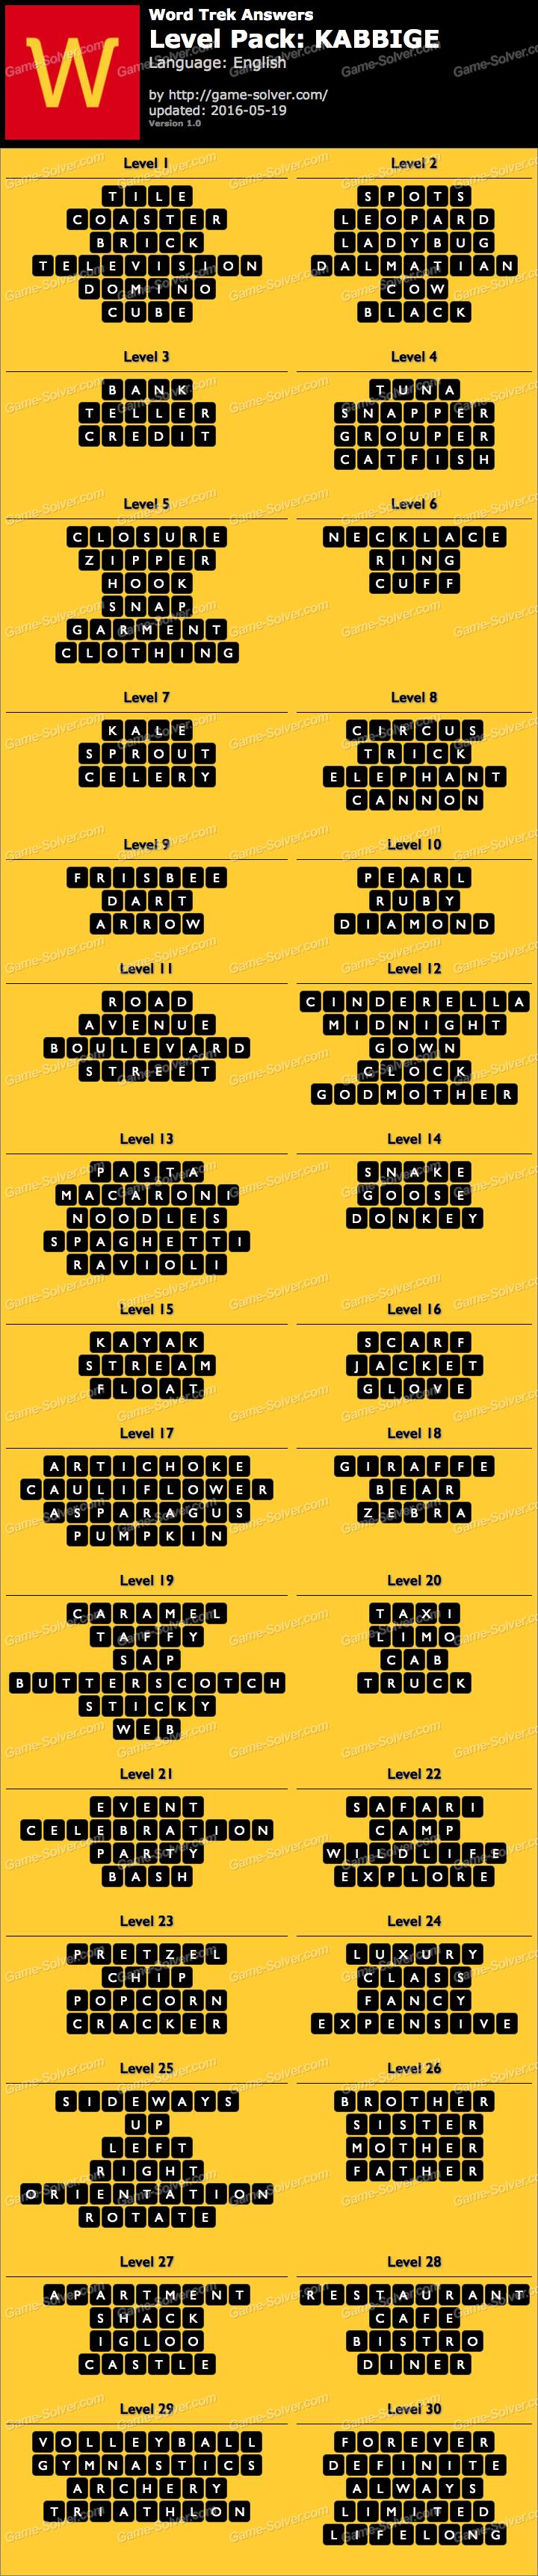 Word Trek Level Pack 62 KABBIGE Answers